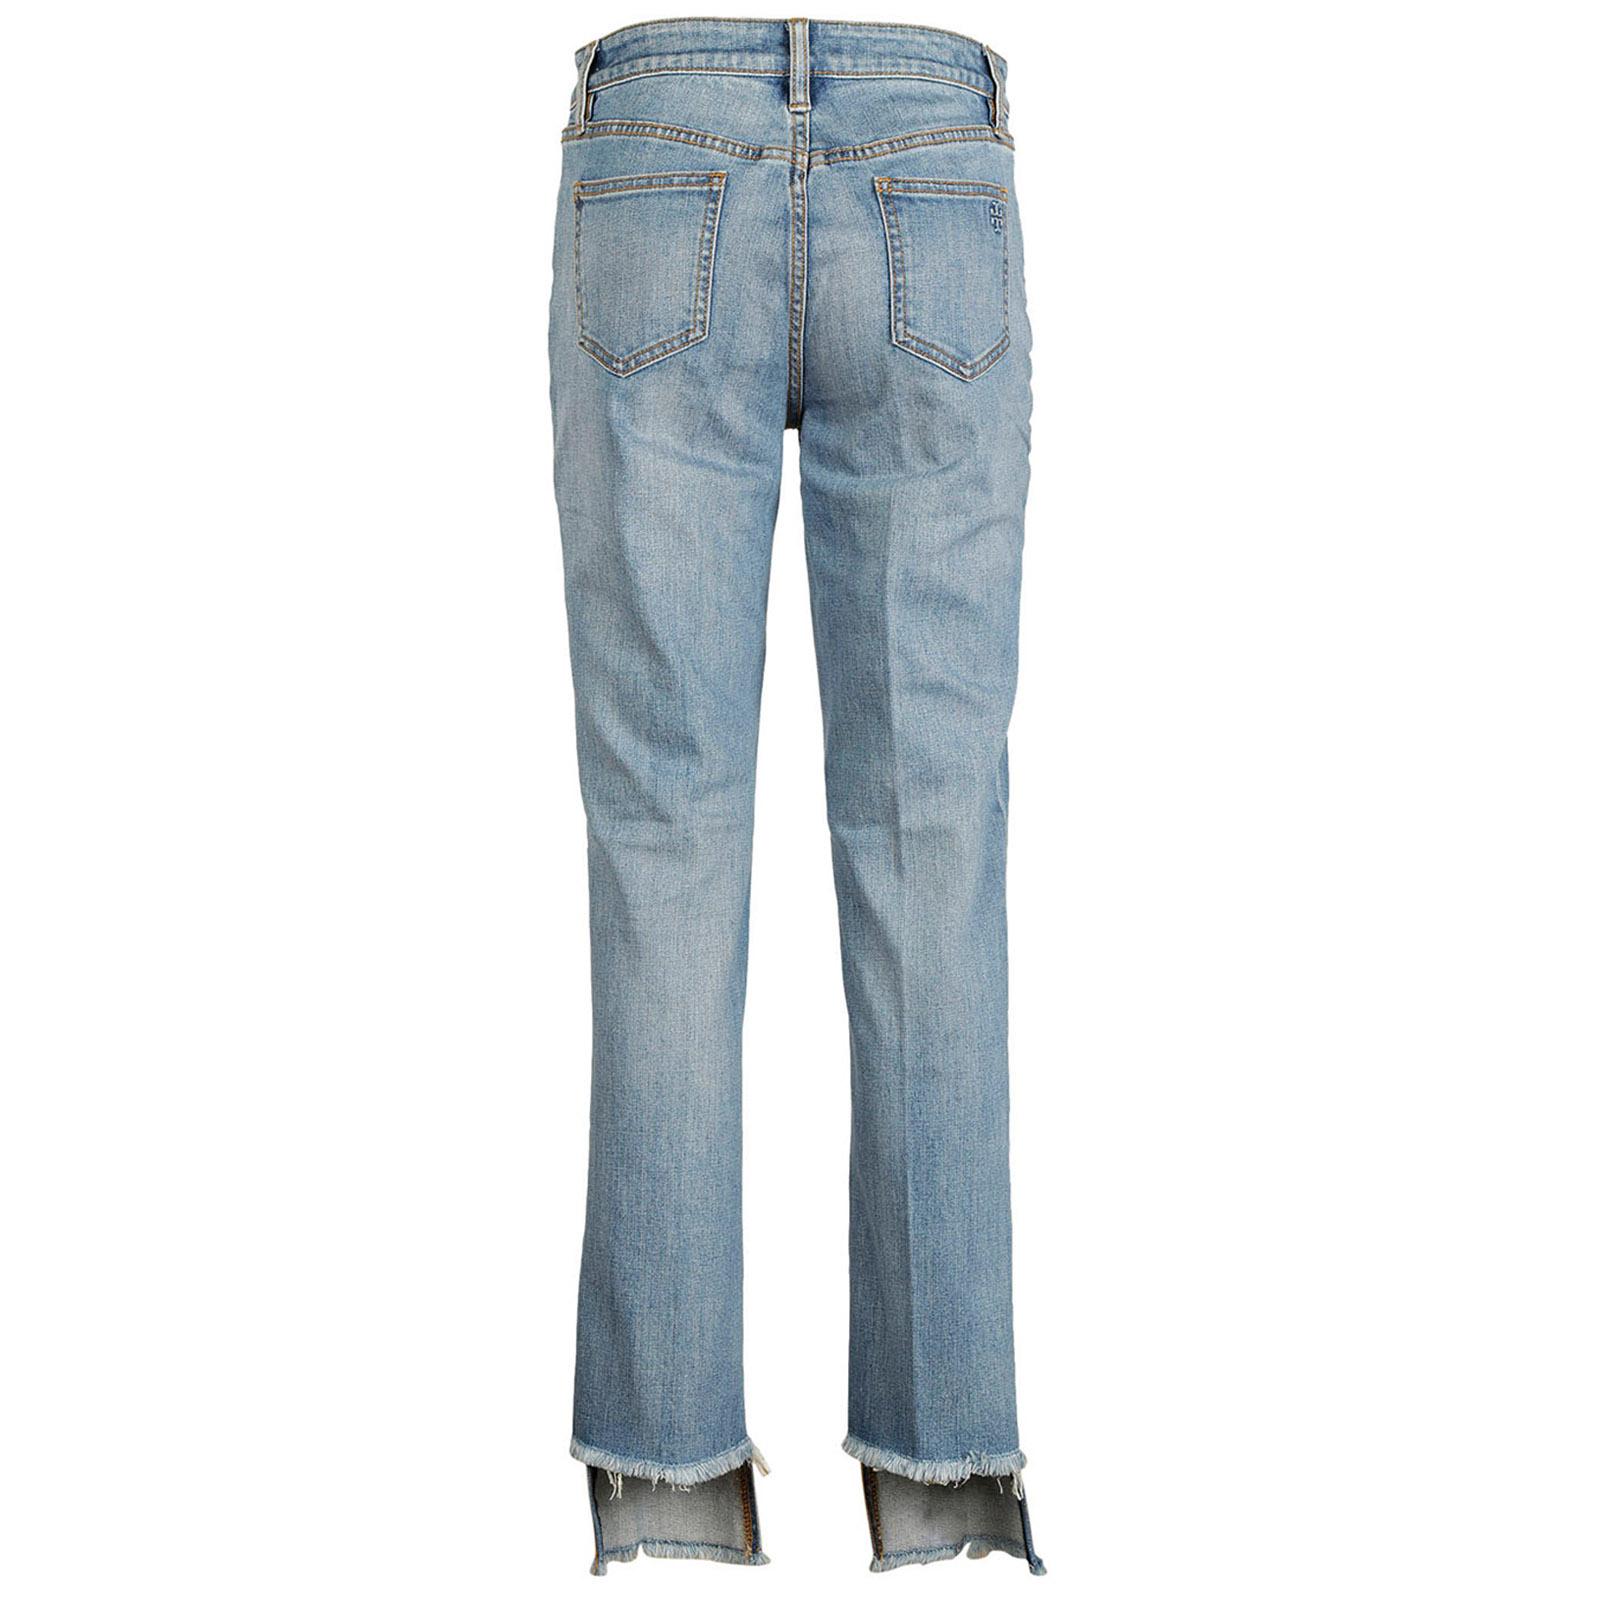 Damen gerade strechthose jeans